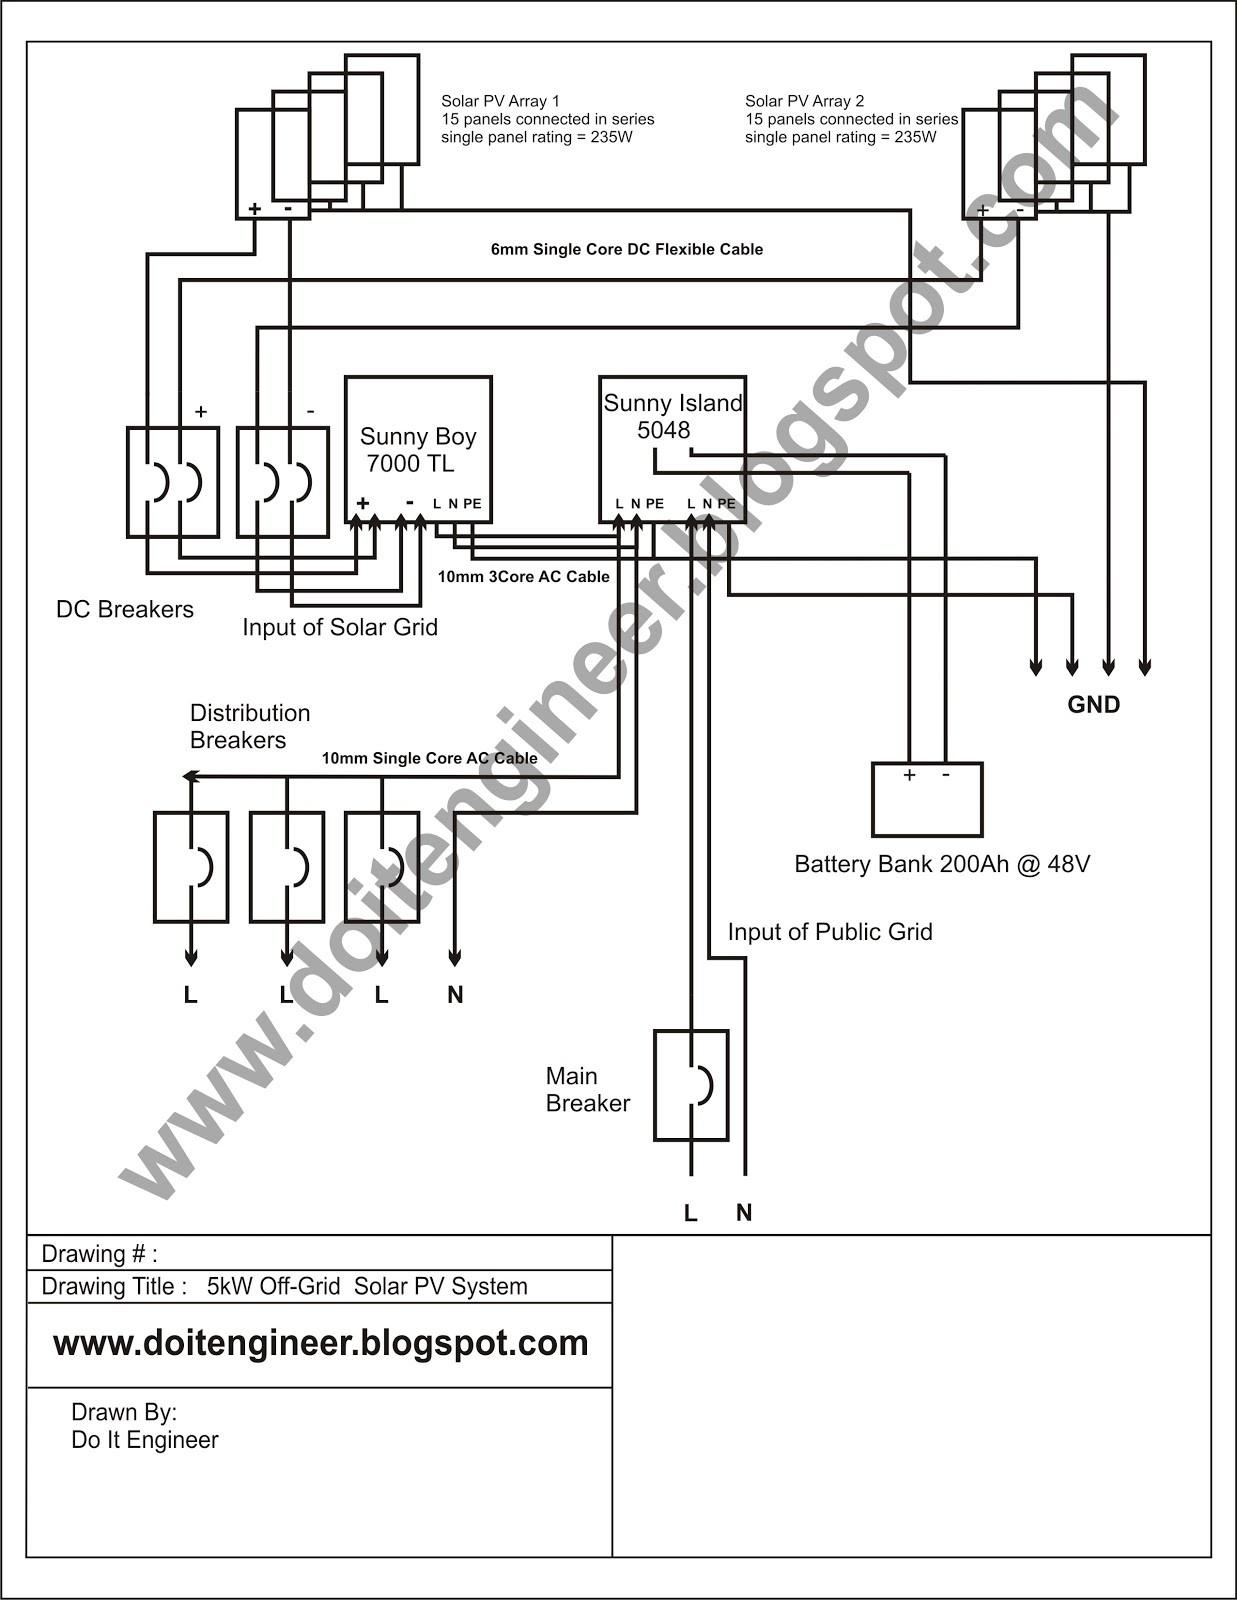 solar system wiring diagram Collection-Solar System Wiring Diagram New 5kw F Grid Solar Pv System Design Hybrid Odsolar 12-k